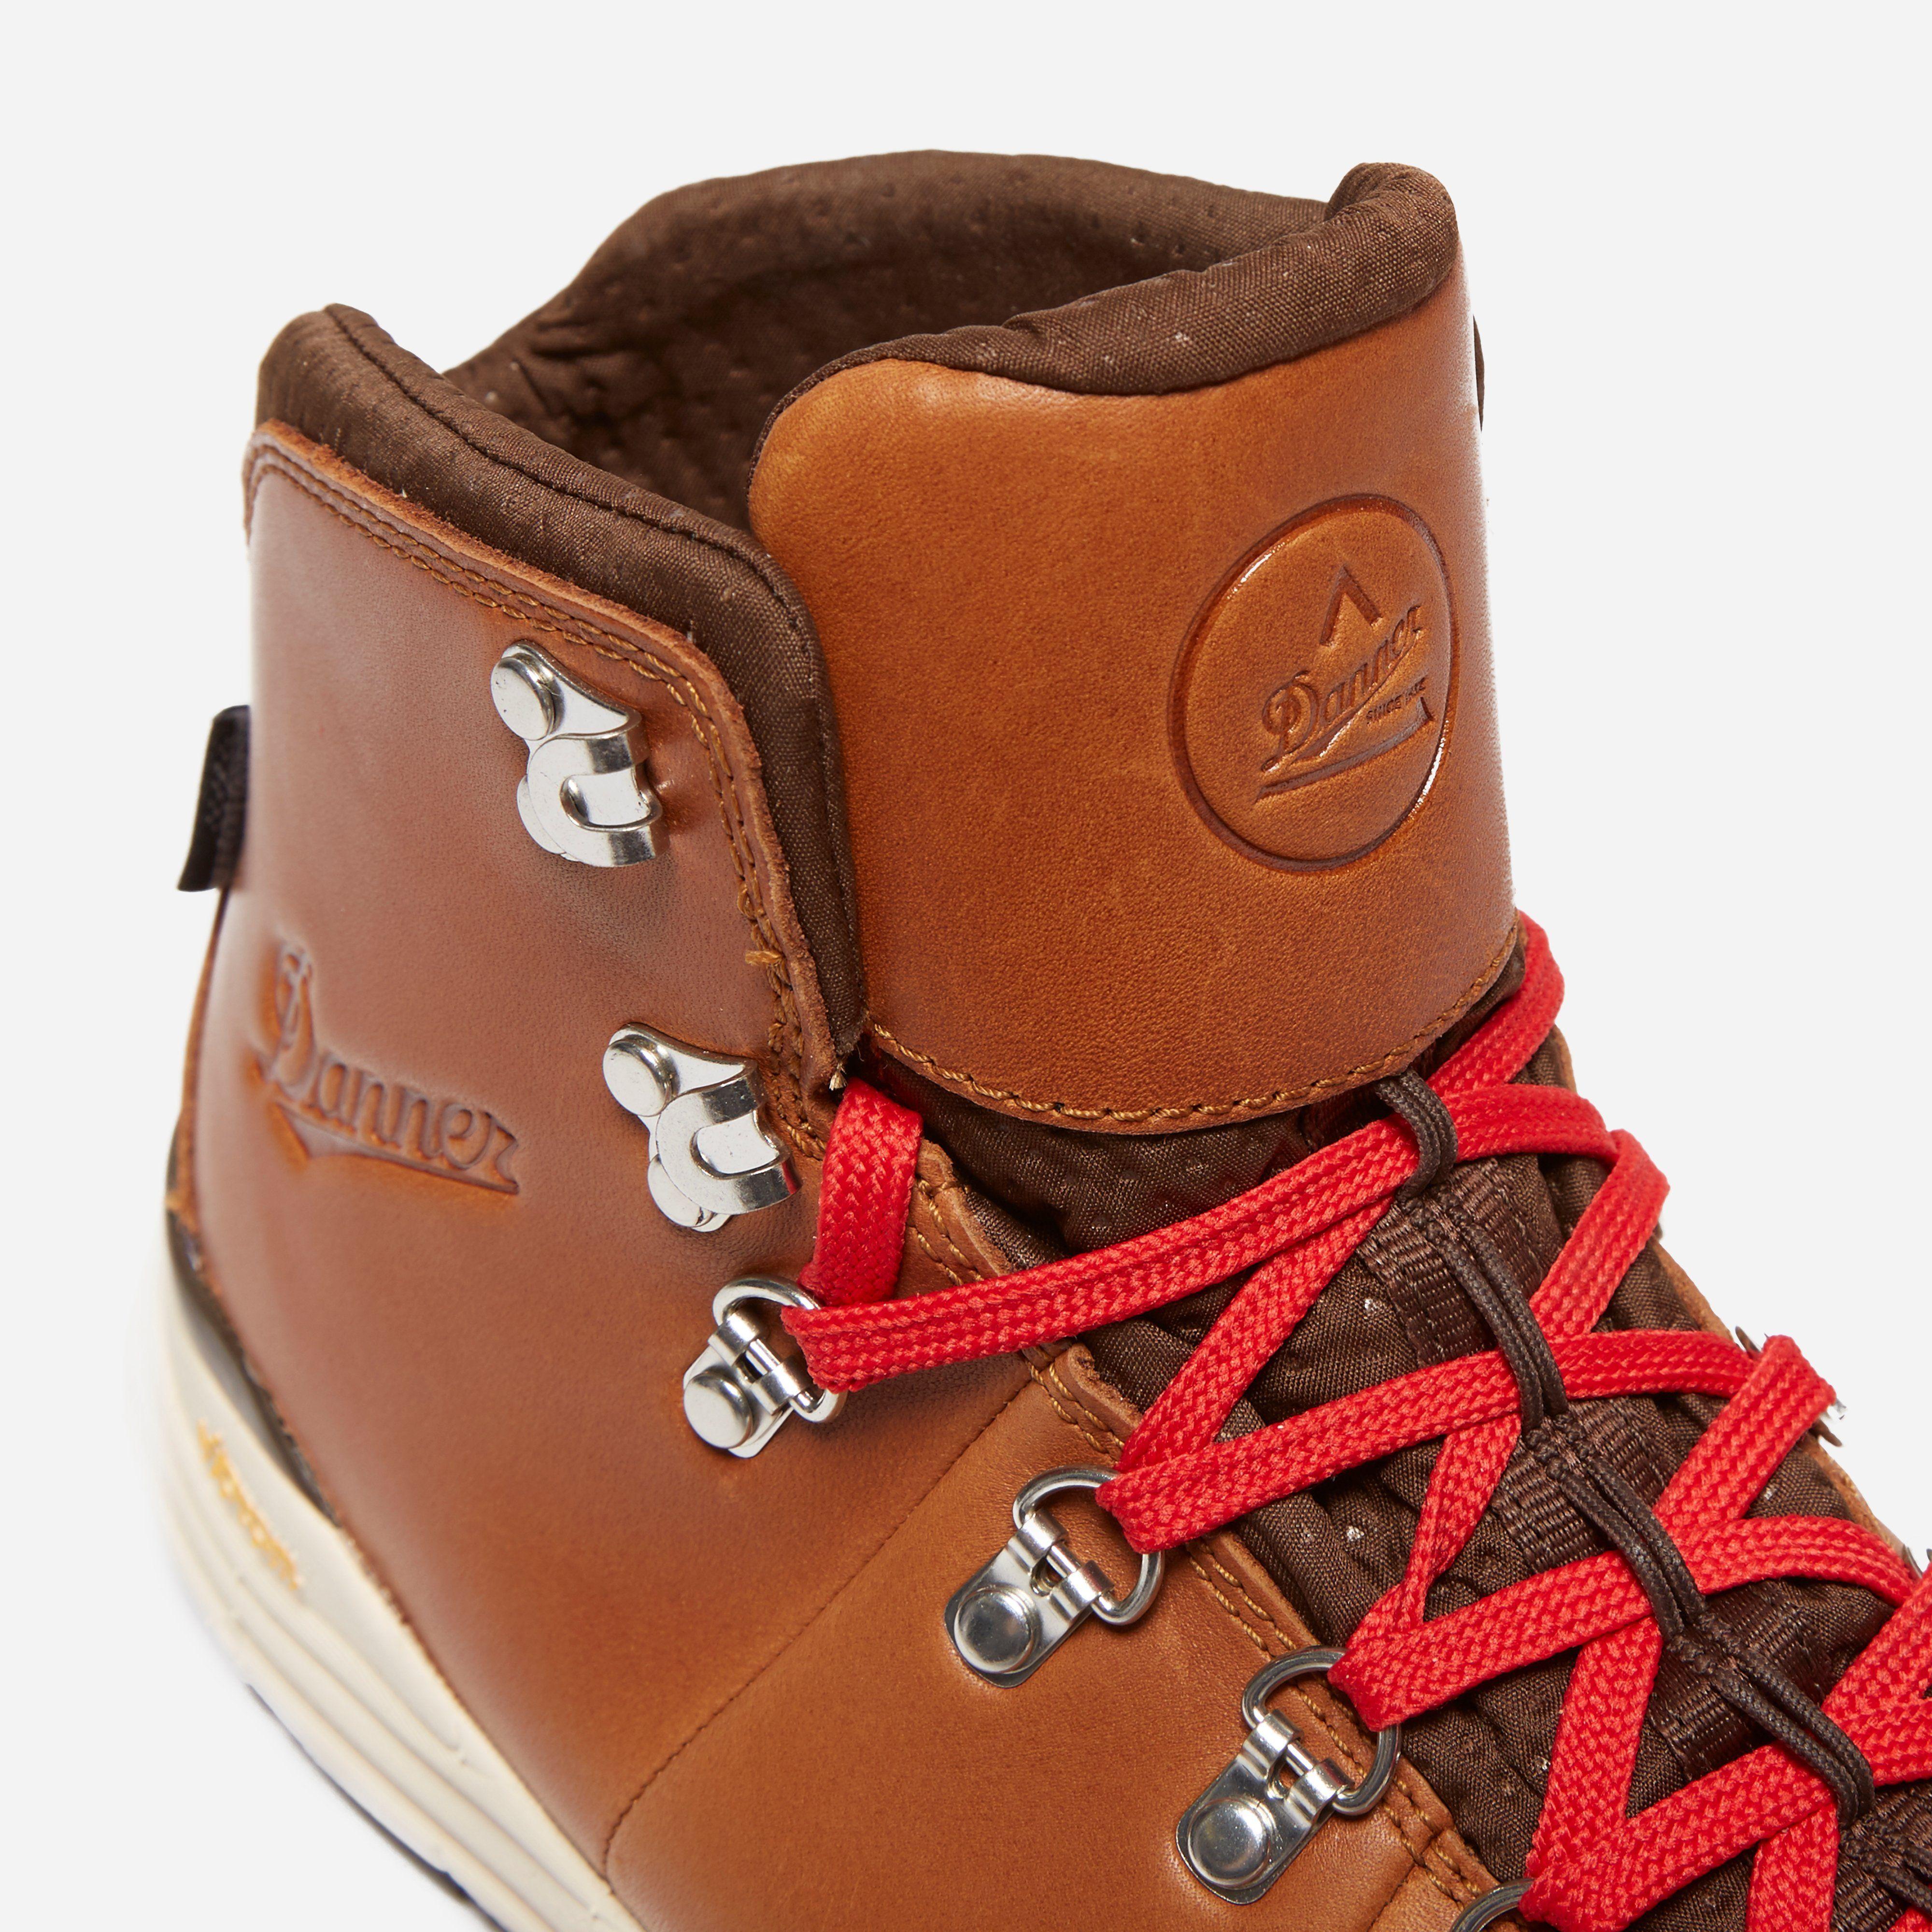 Danner Mountain 600 Boot